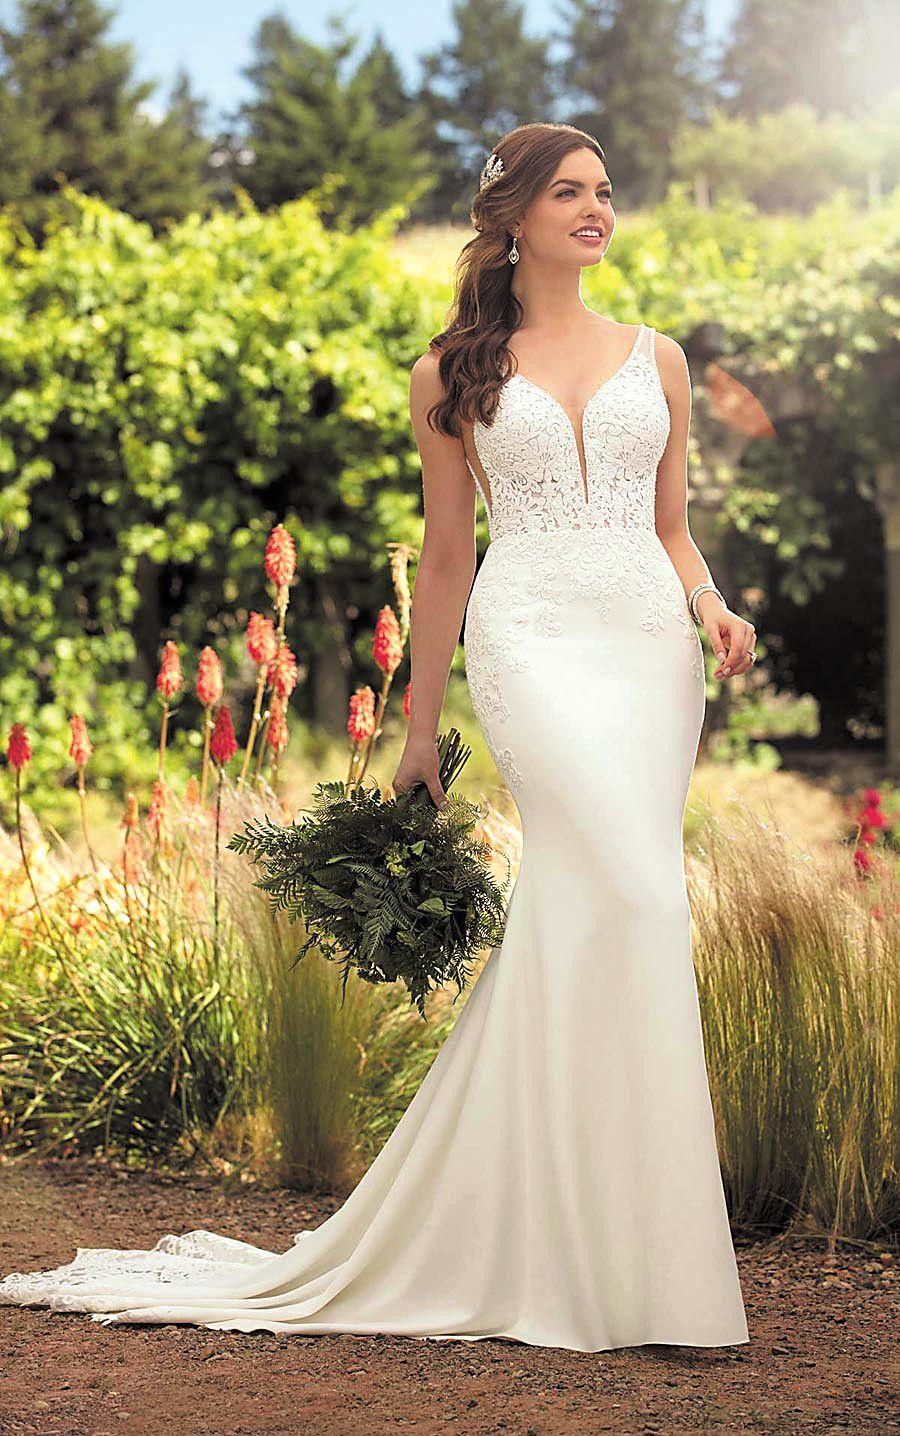 look of love experts track 2018 wedding gown trends weddings